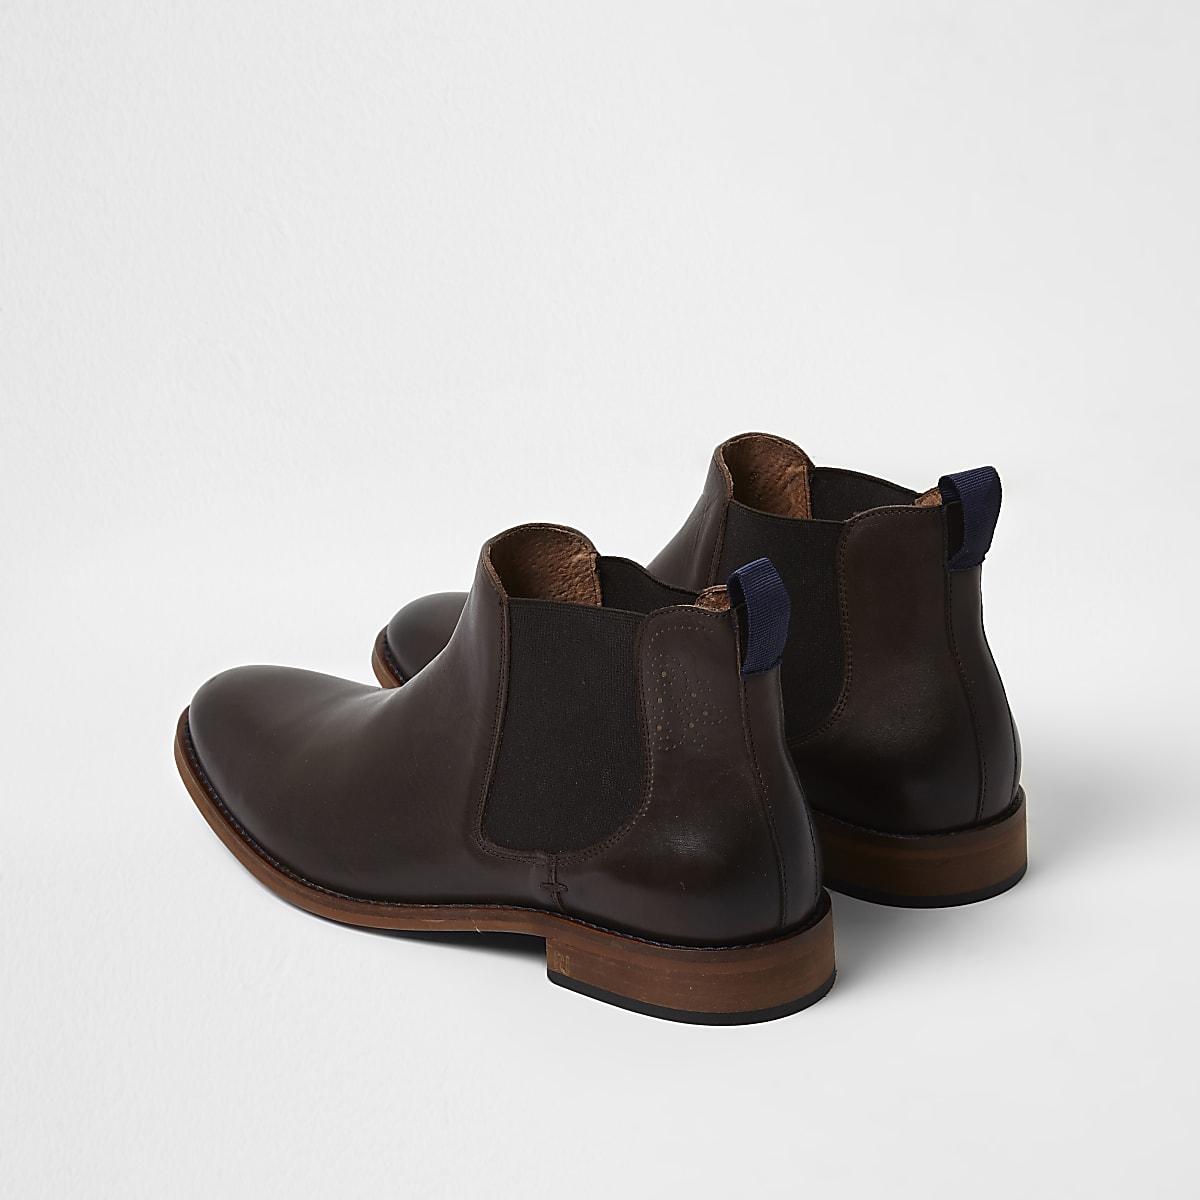 c4725b8b365 Dark brown leather chelsea boots